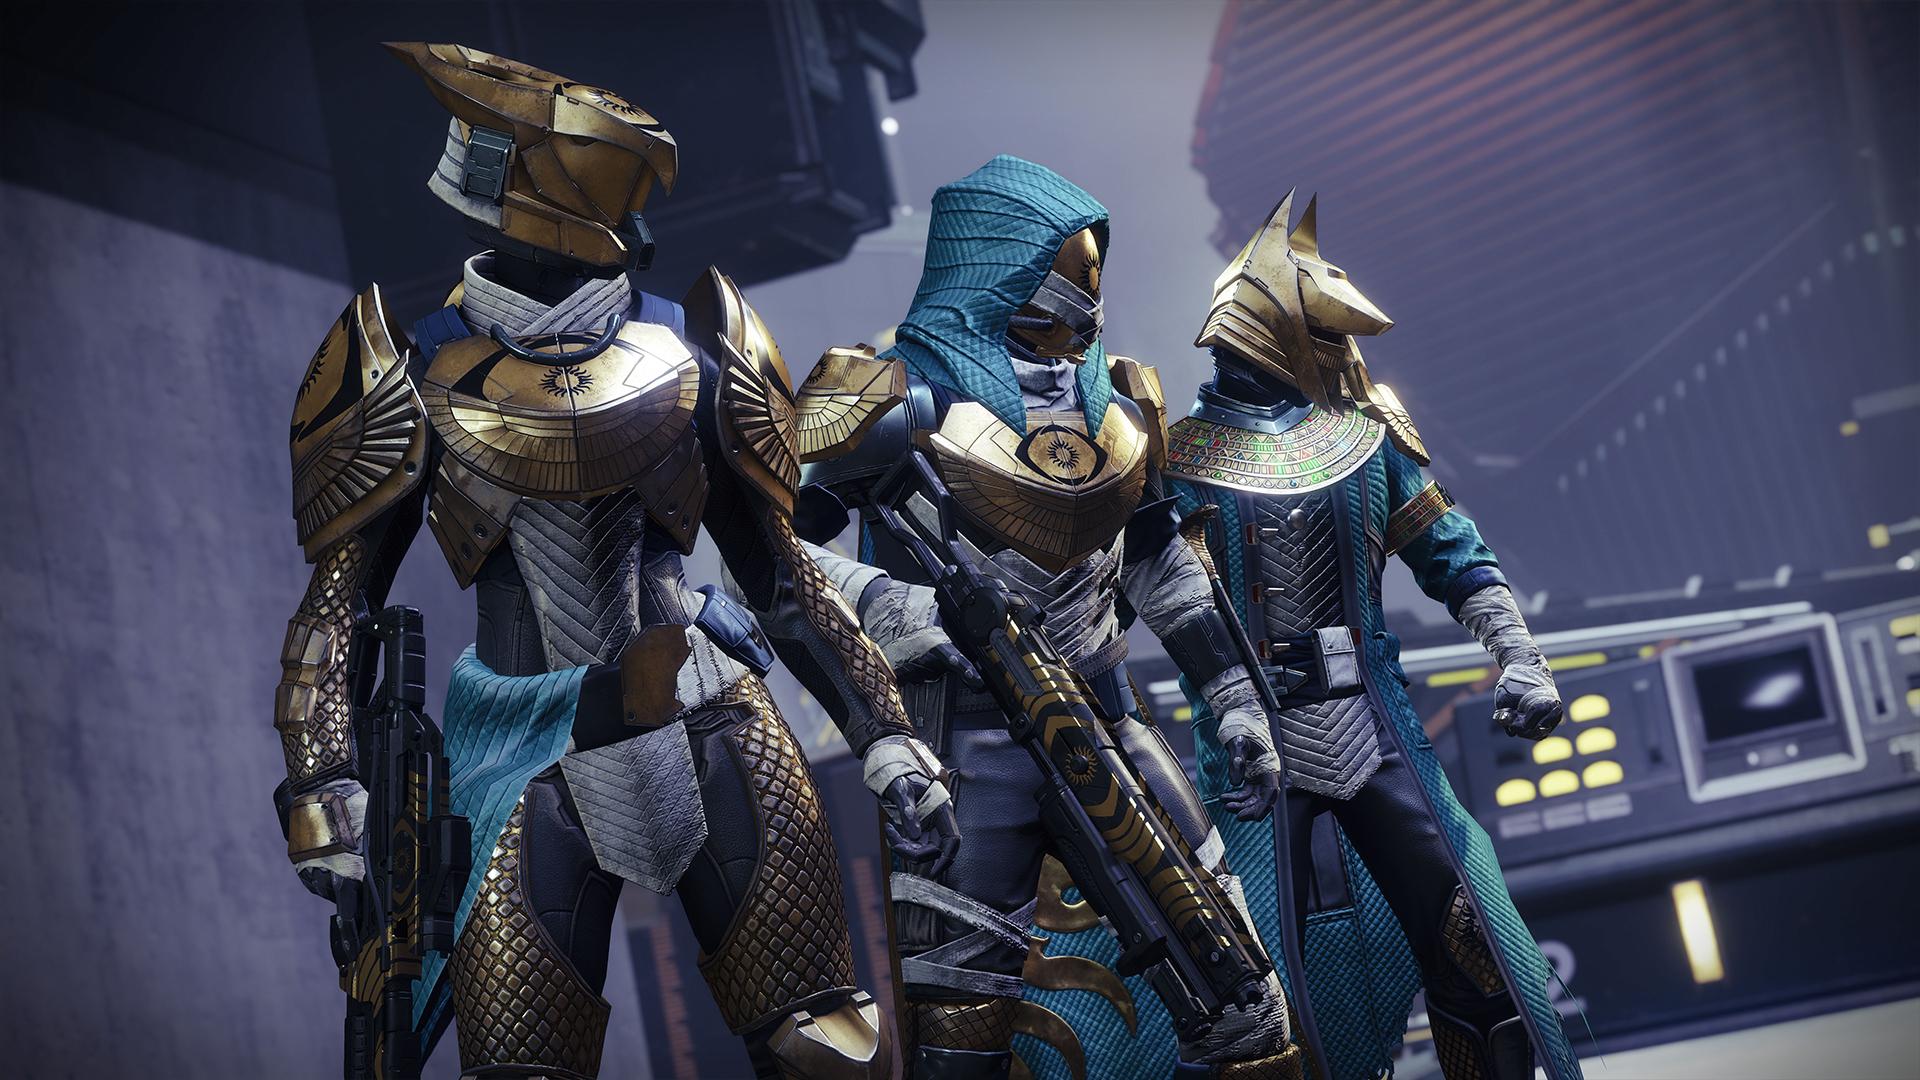 Trials of Osiris Map for October 16, 2020